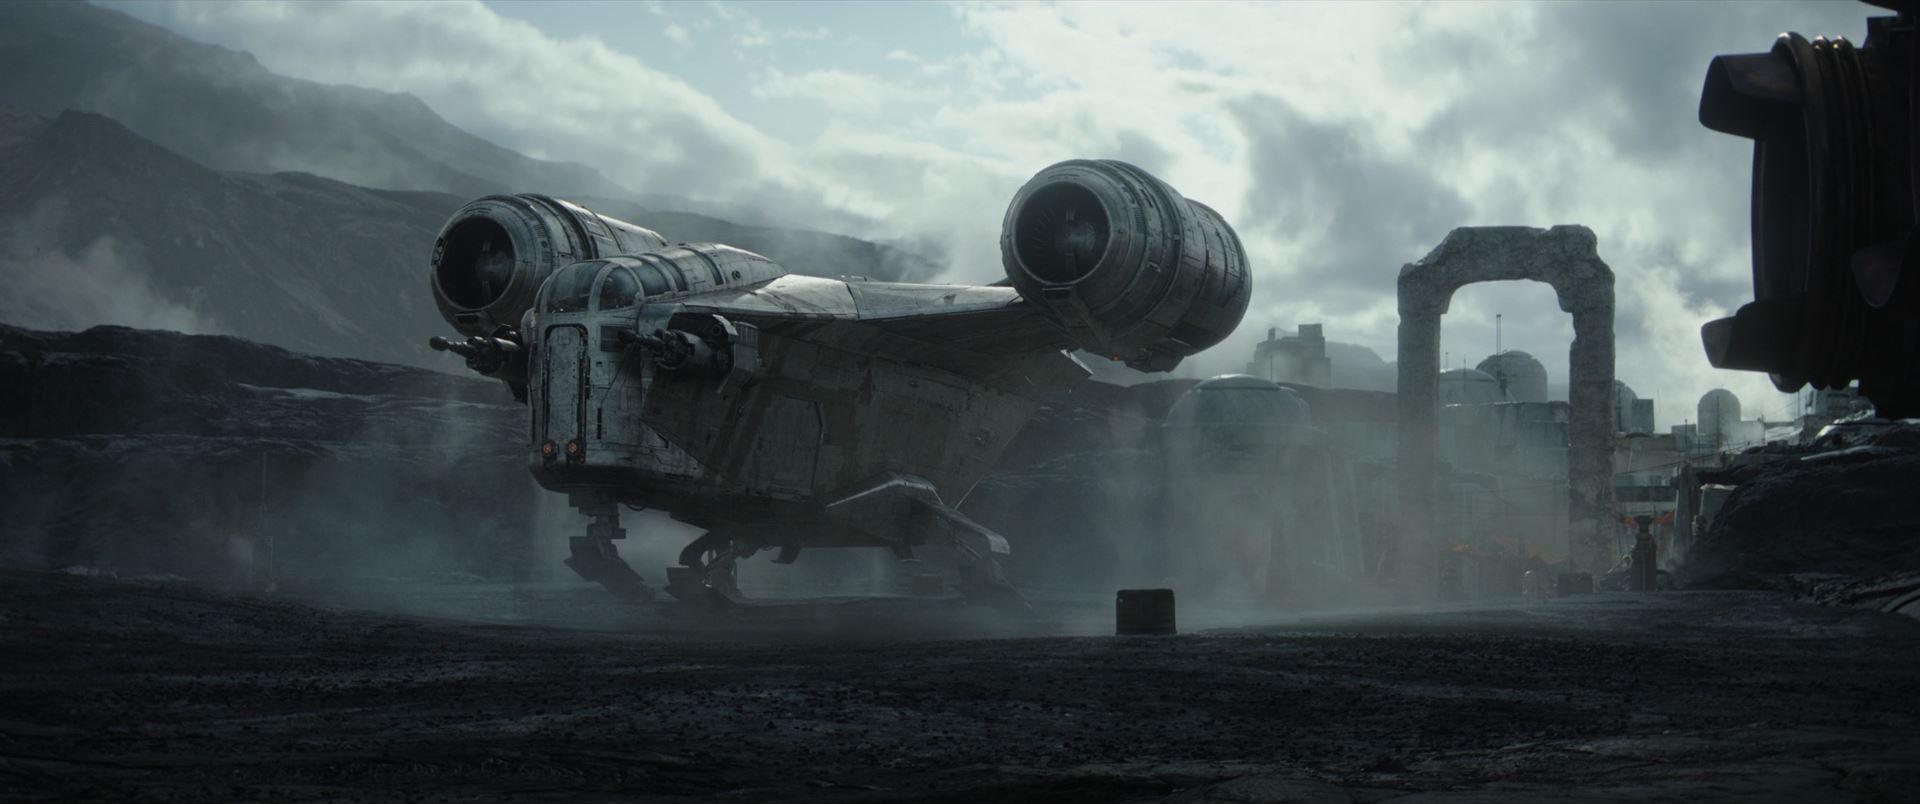 The Mandalorian - the ship of a bounty hunter